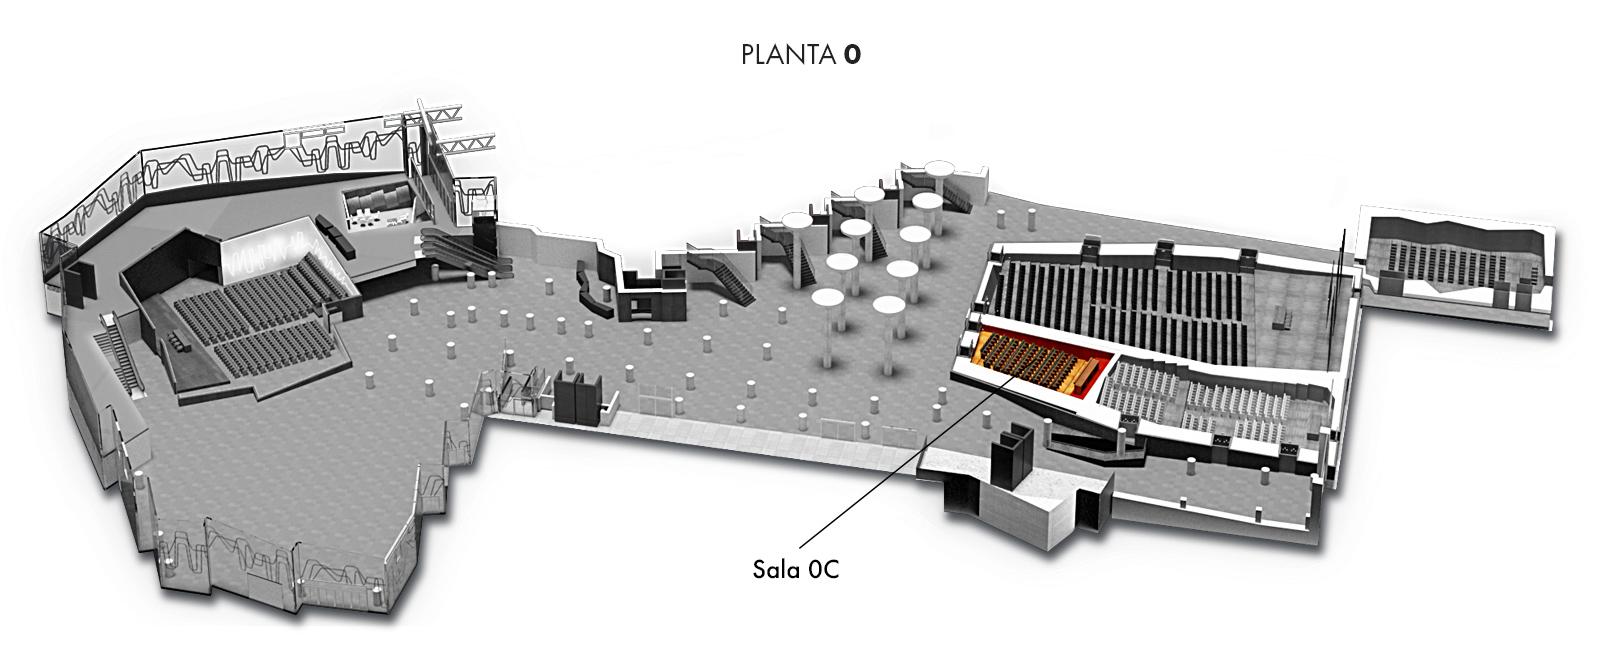 Sala 0C, Planta 0   Palacio Euskalduna Jauregia